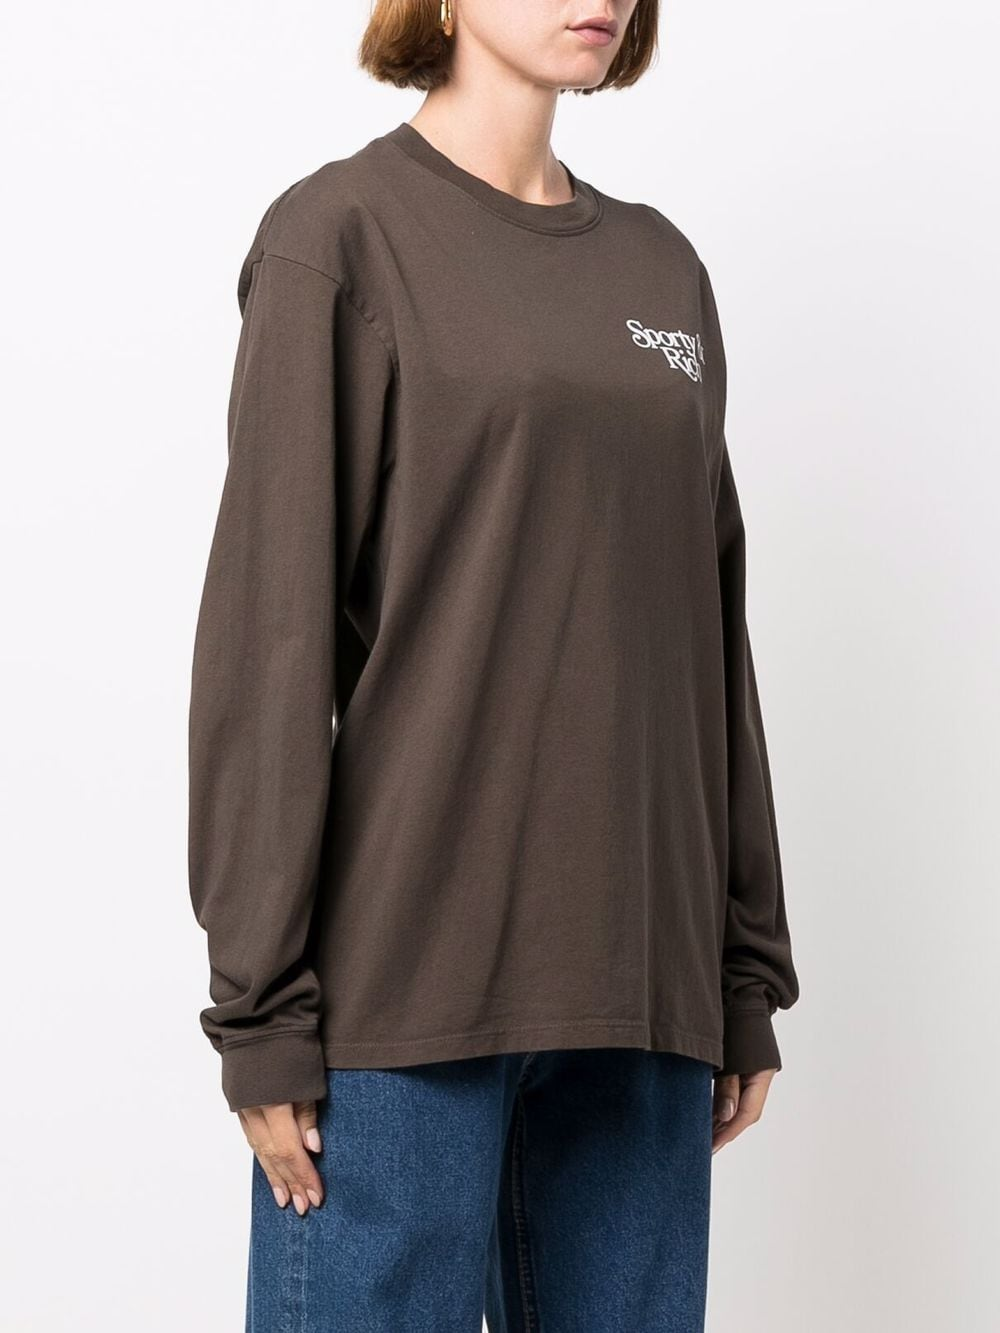 bardot t-shirt women brown in cotton SPORTY & RICH | T-shirts | LO261CH